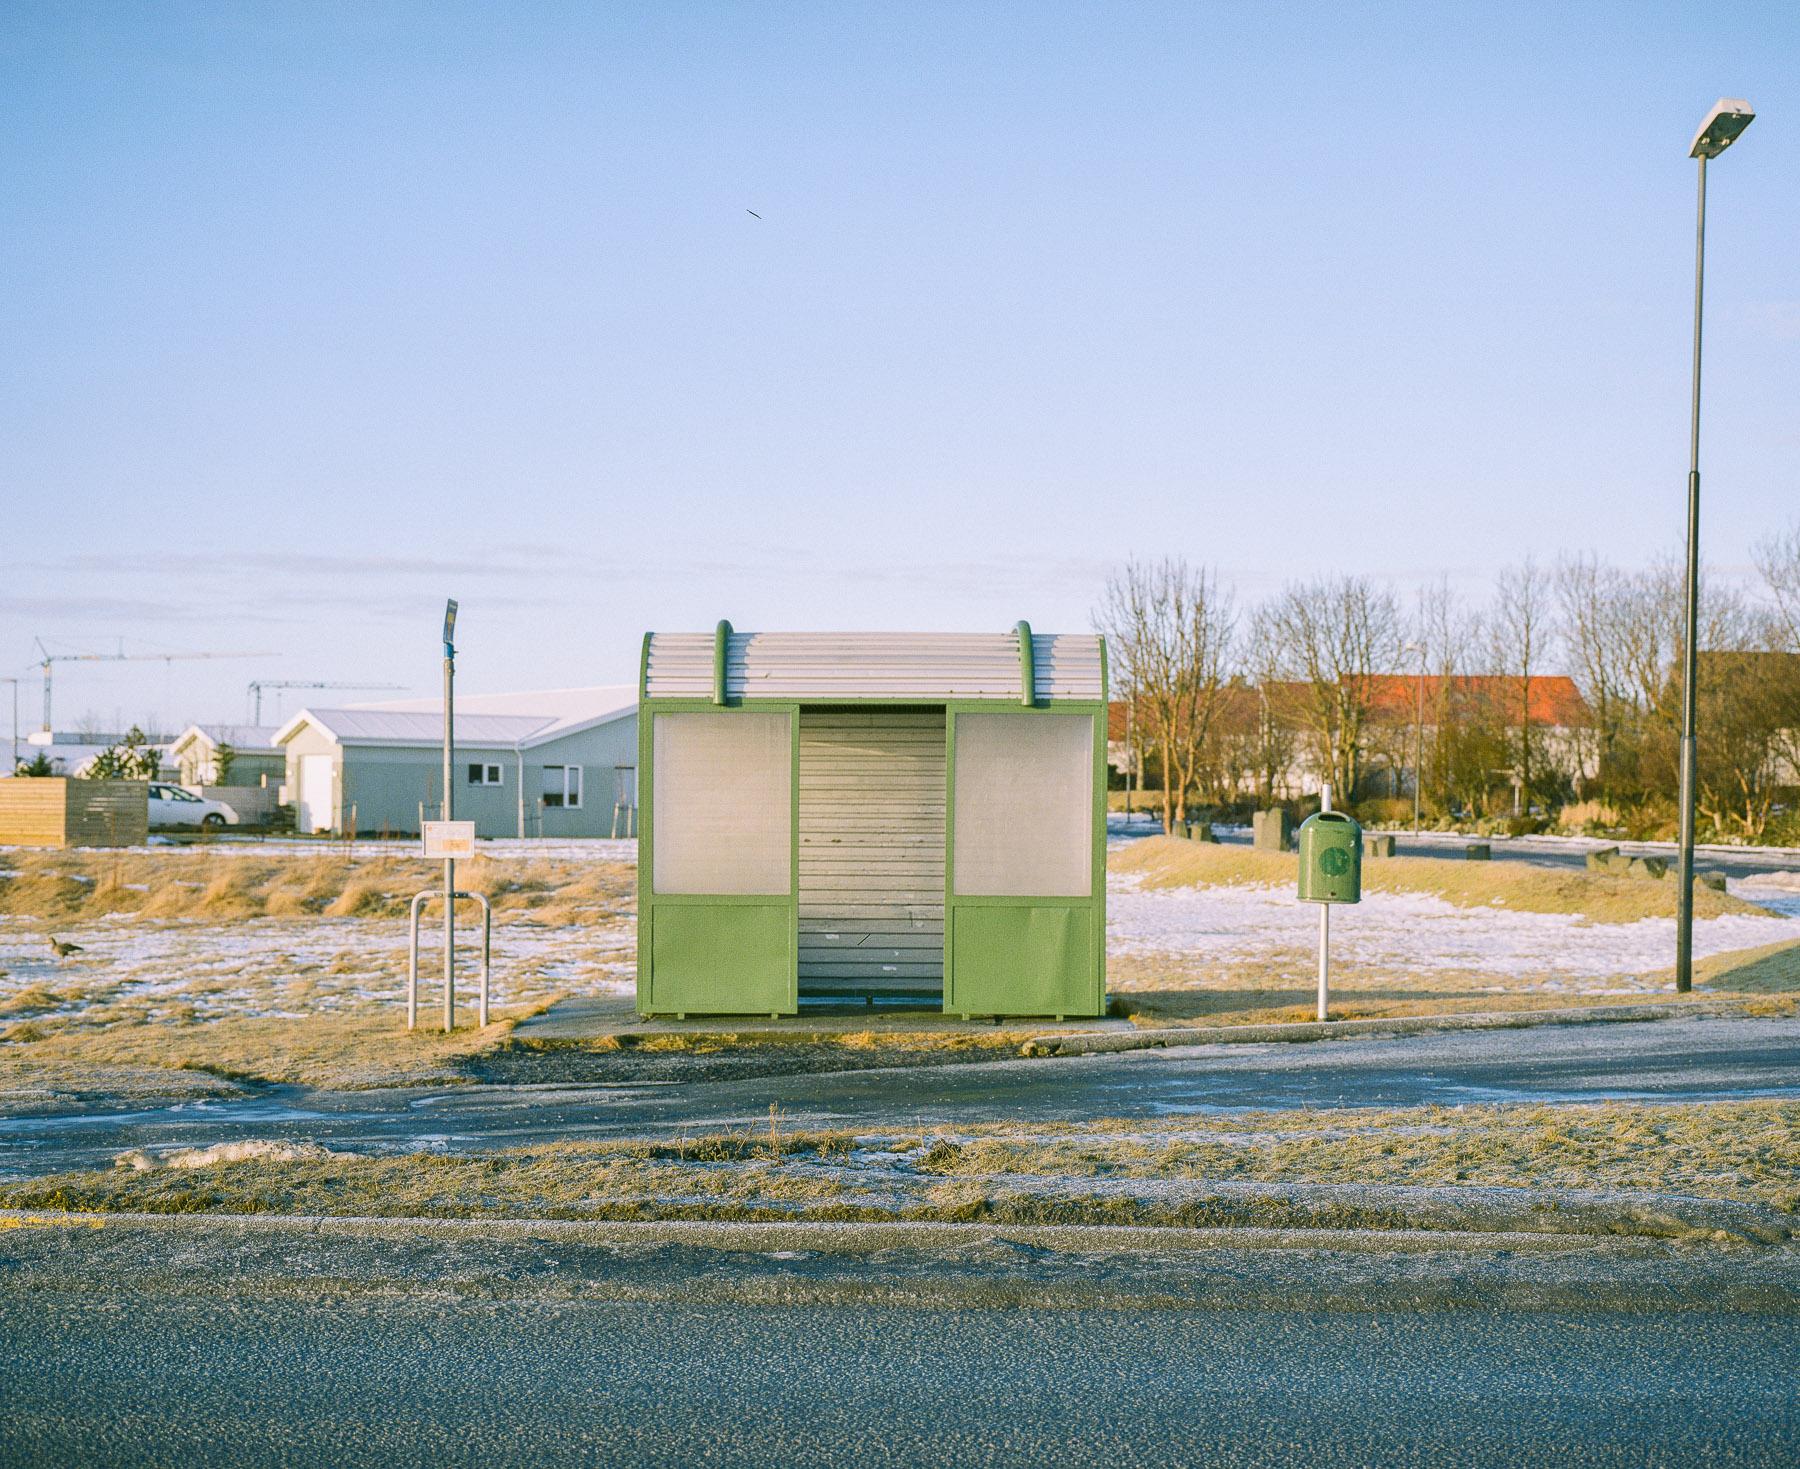 Iceland_Bus_stops21.jpg